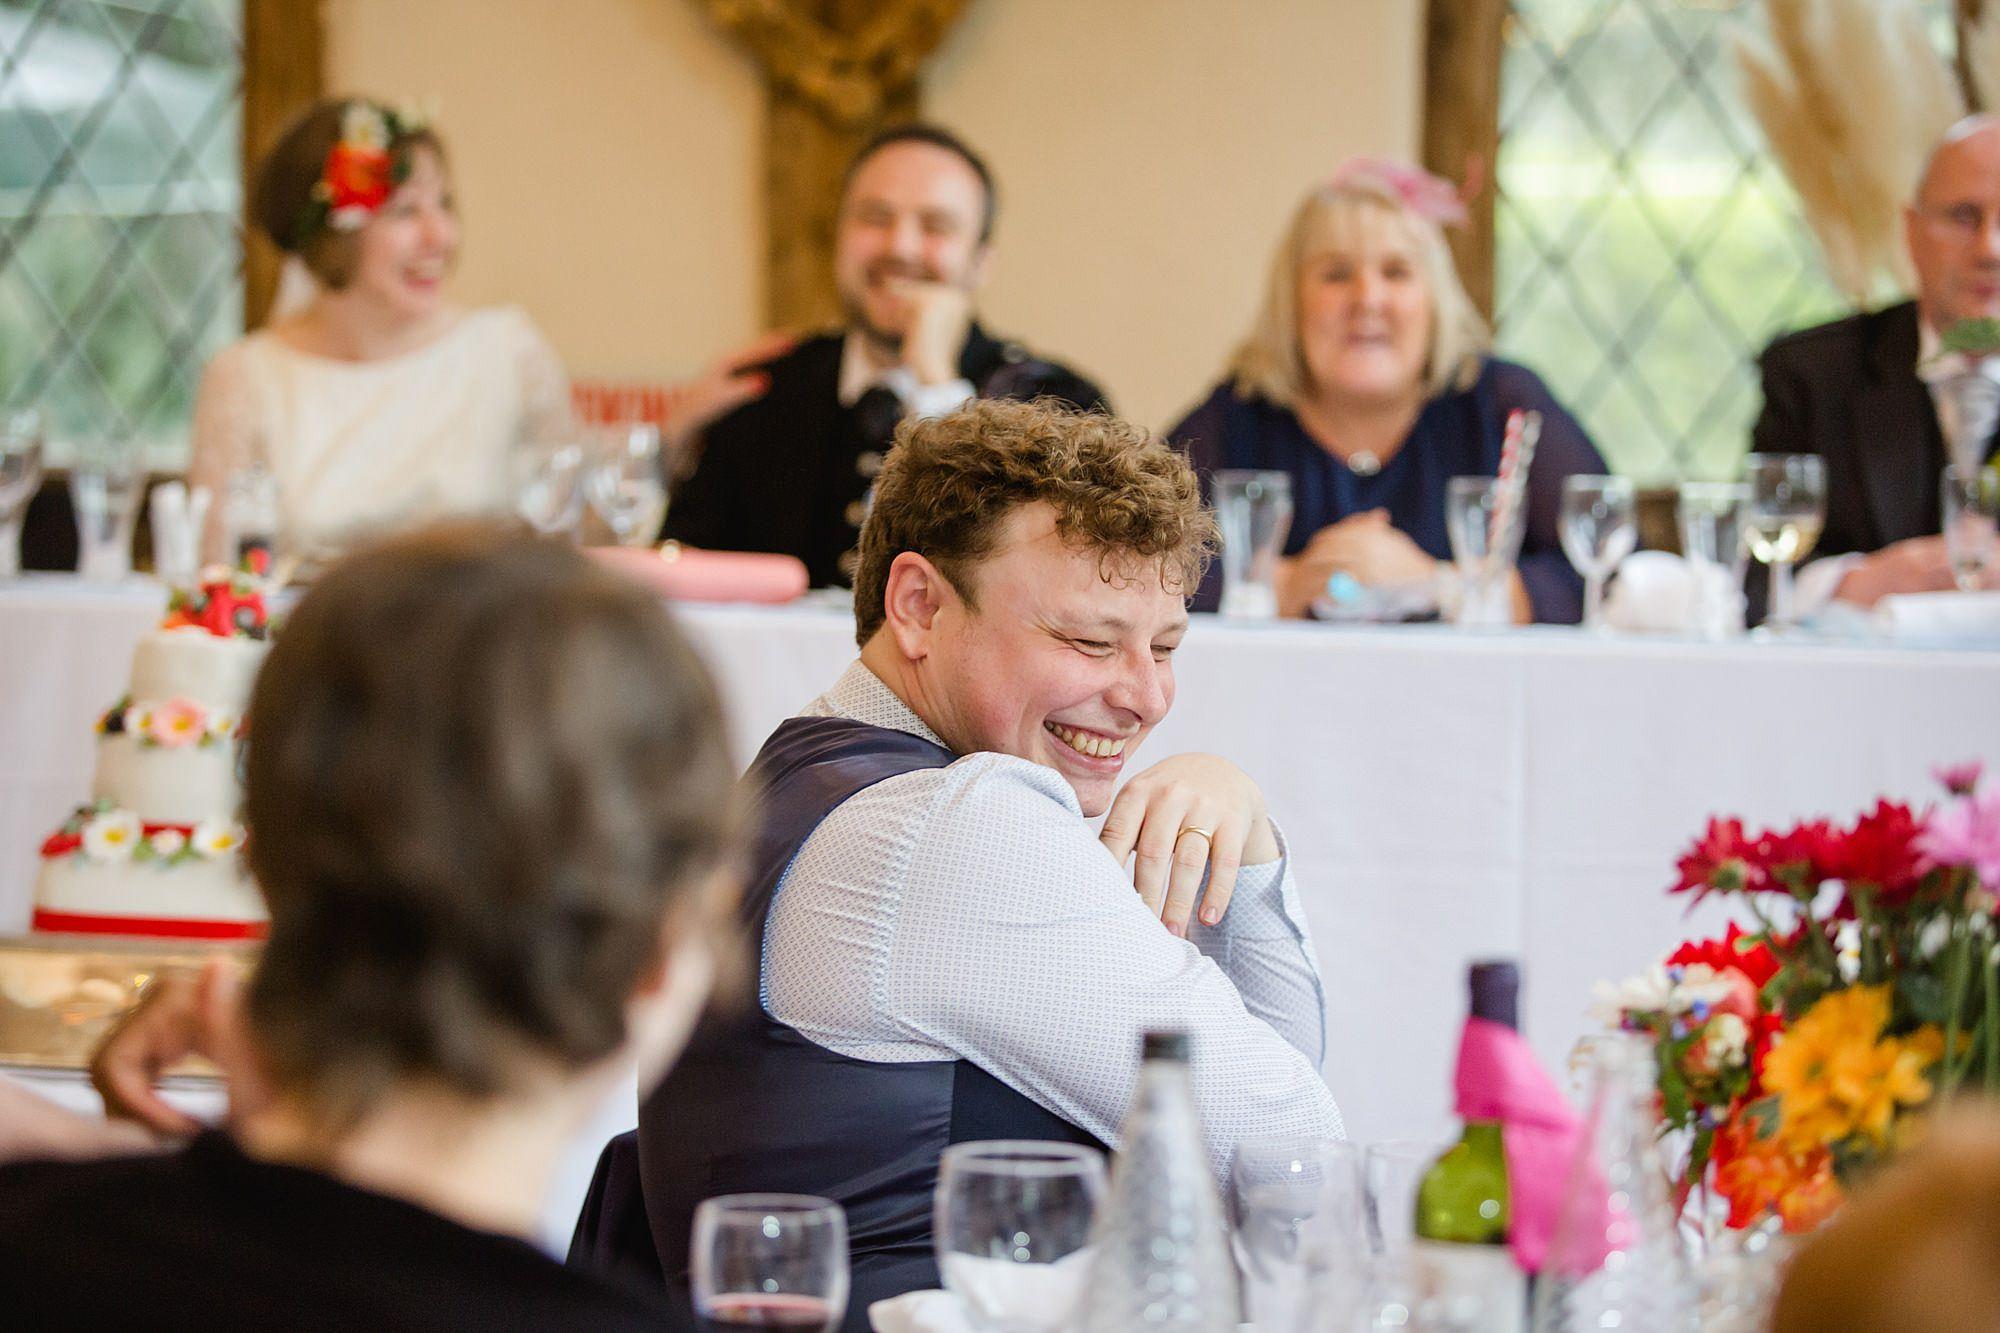 Fun DIY wedding guest laughing during speeches